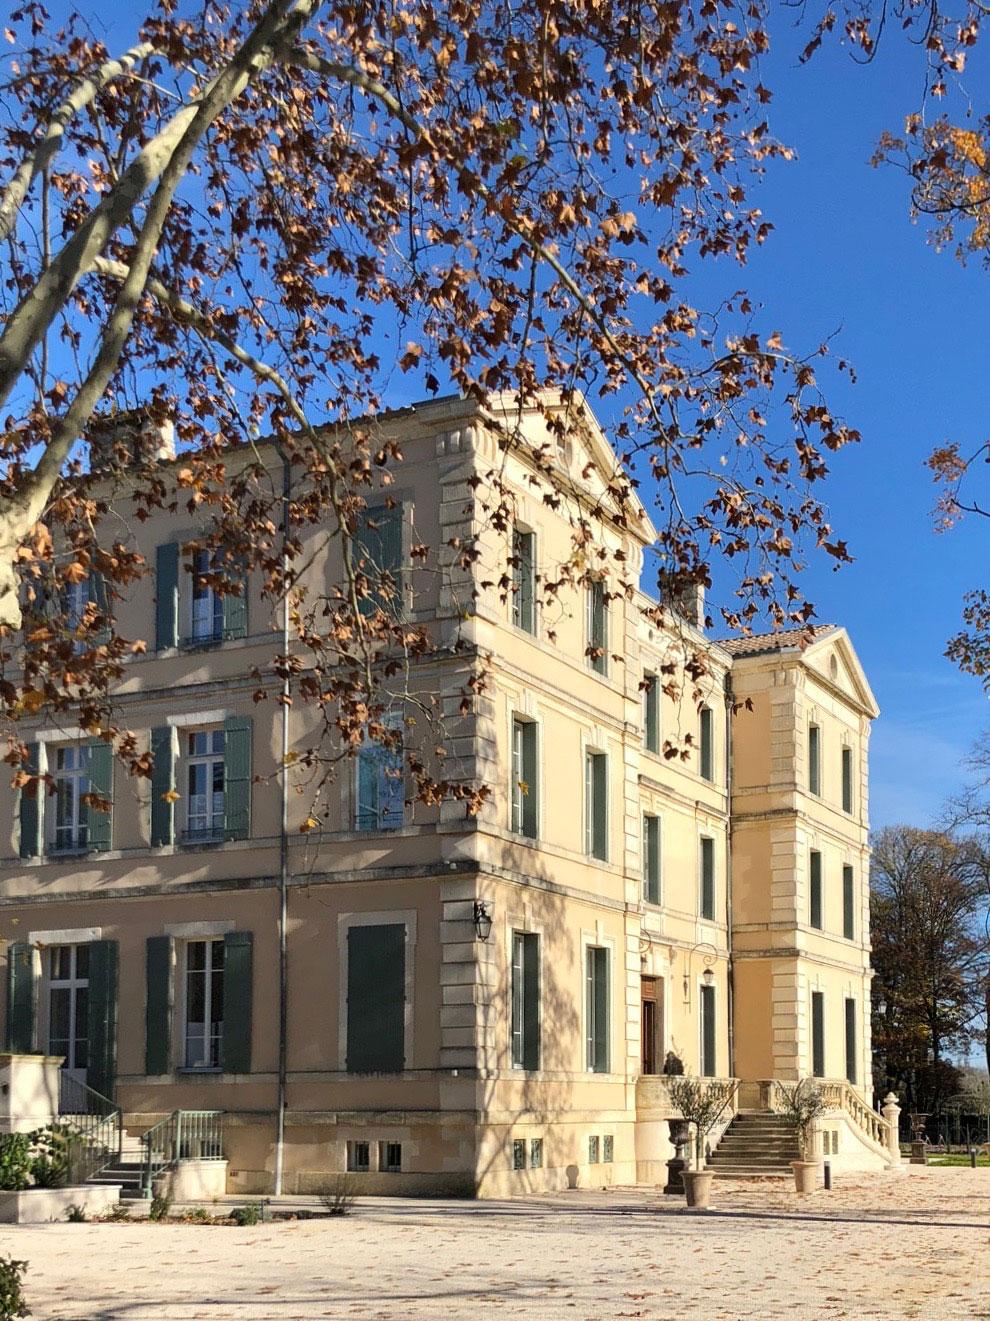 iria degen interiors chateau-de-montcaud france_01.jpg